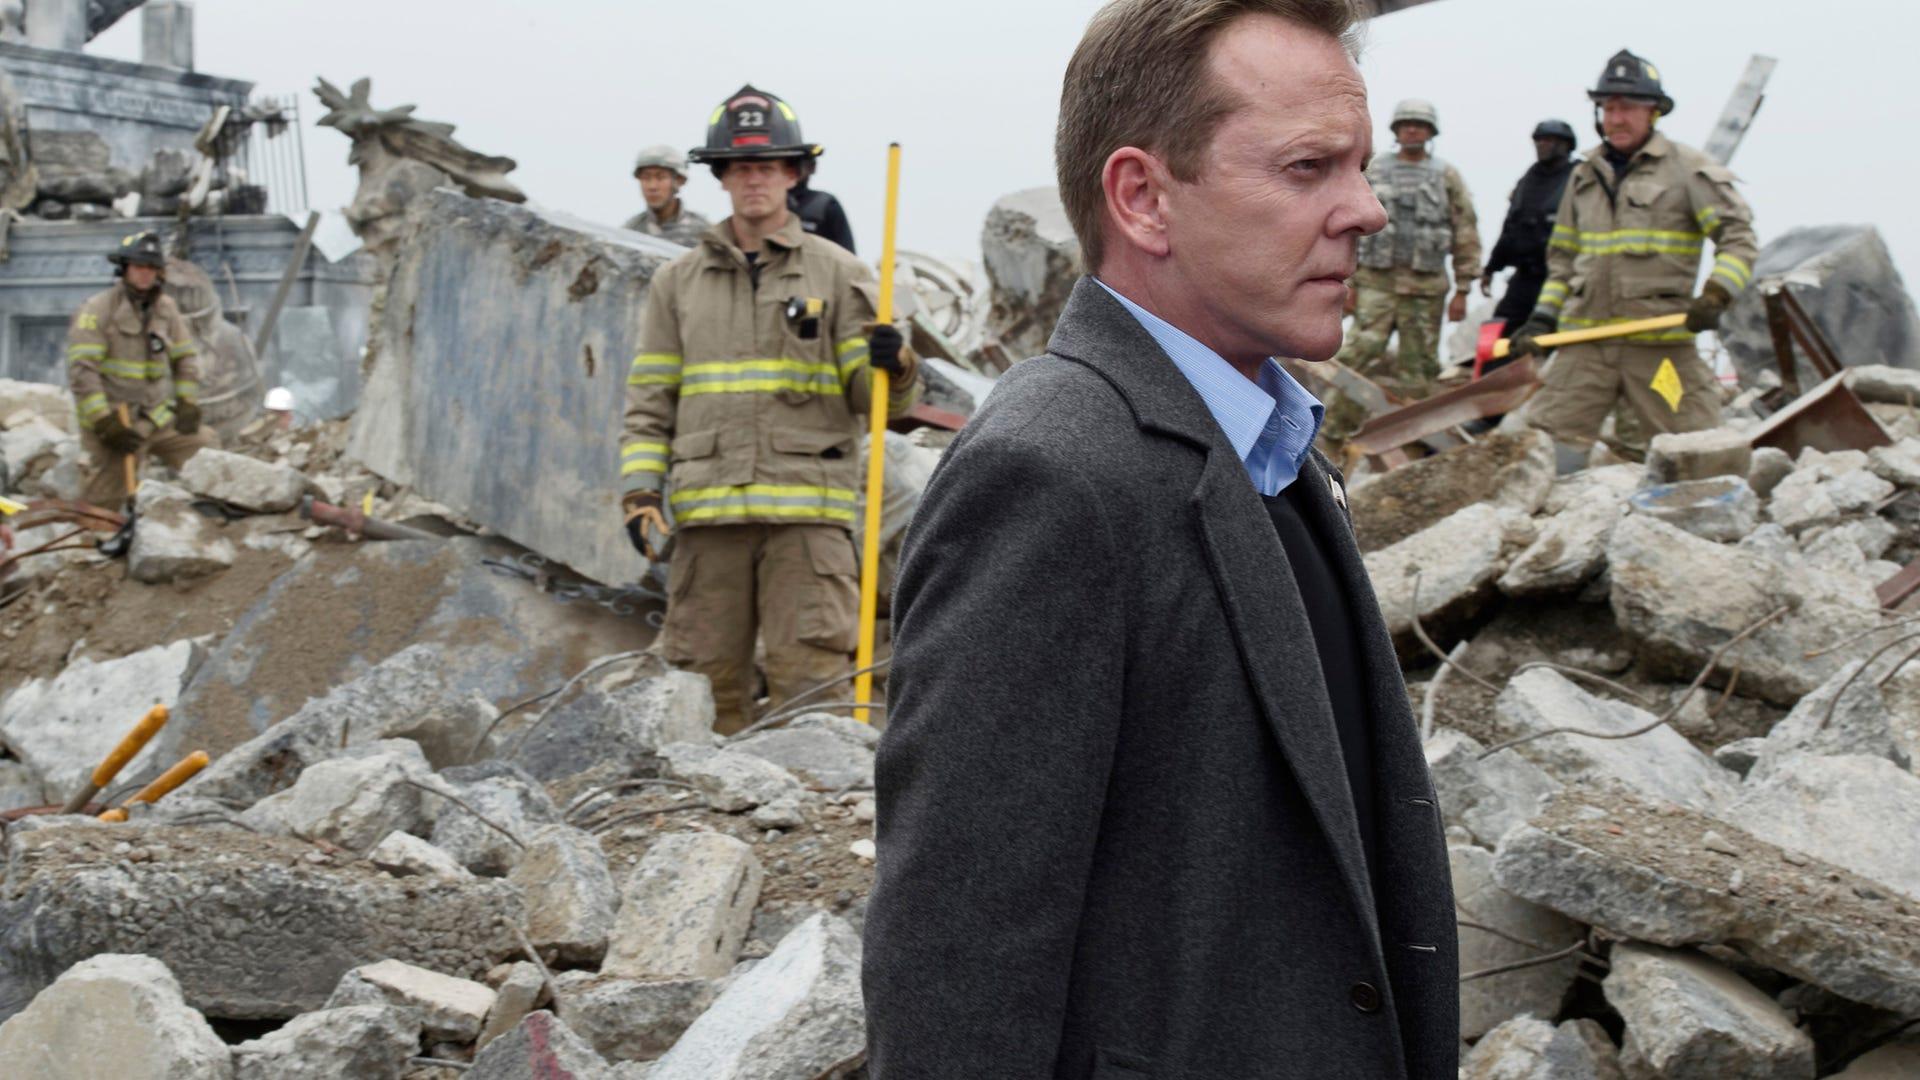 Kiefer Sutherland, Designated Survivor